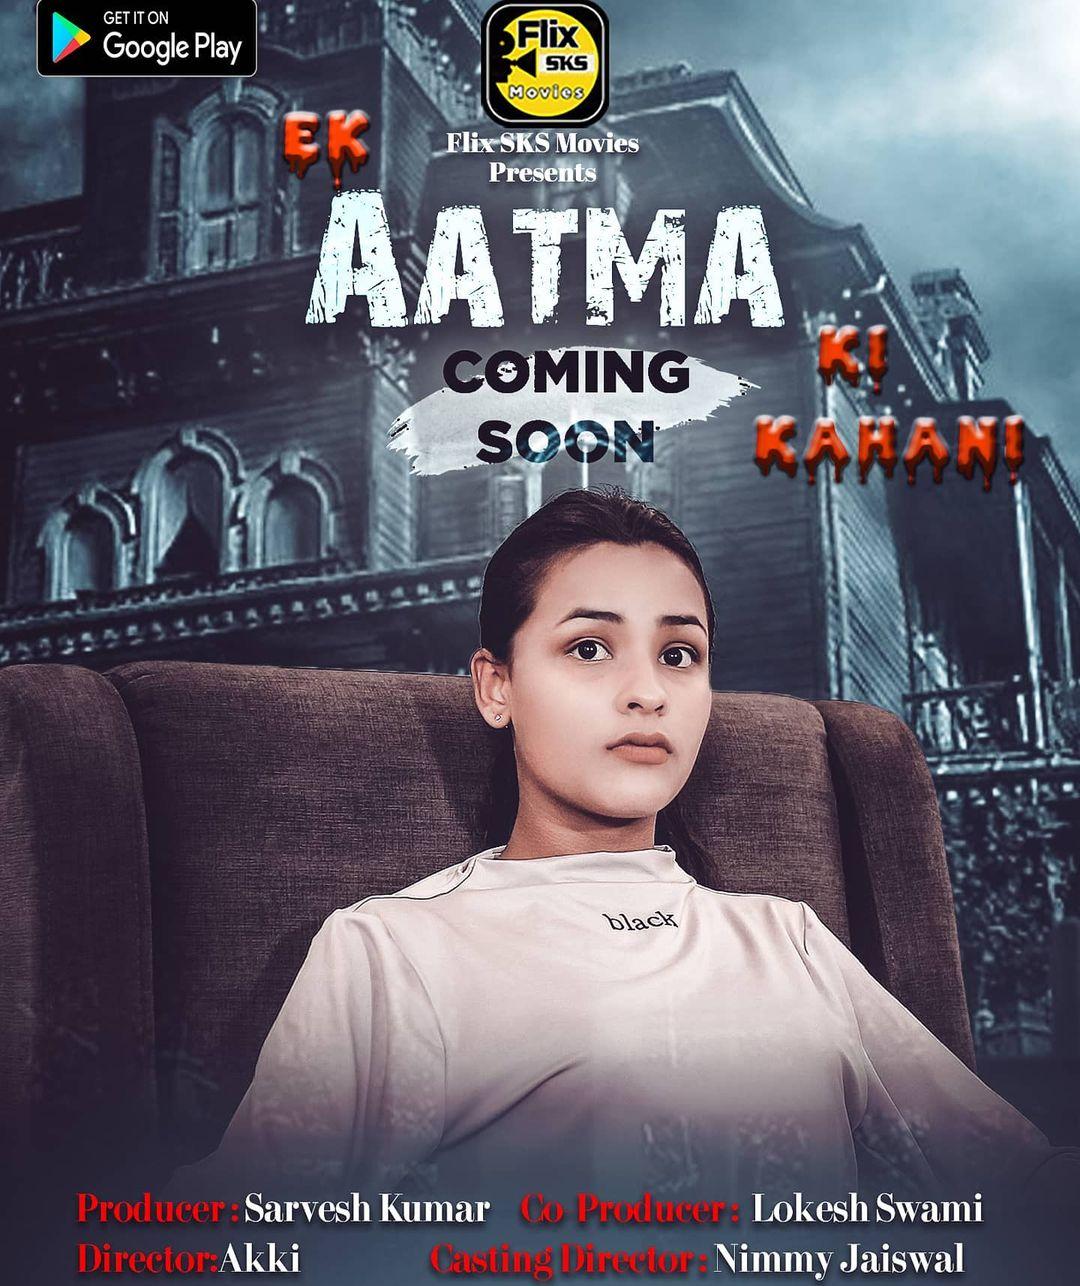 Ek Aatma Ki Kahani 2020 S01E01 FlixSKSMovies Original Hindi Web Series 720p HDRip 170MB Download